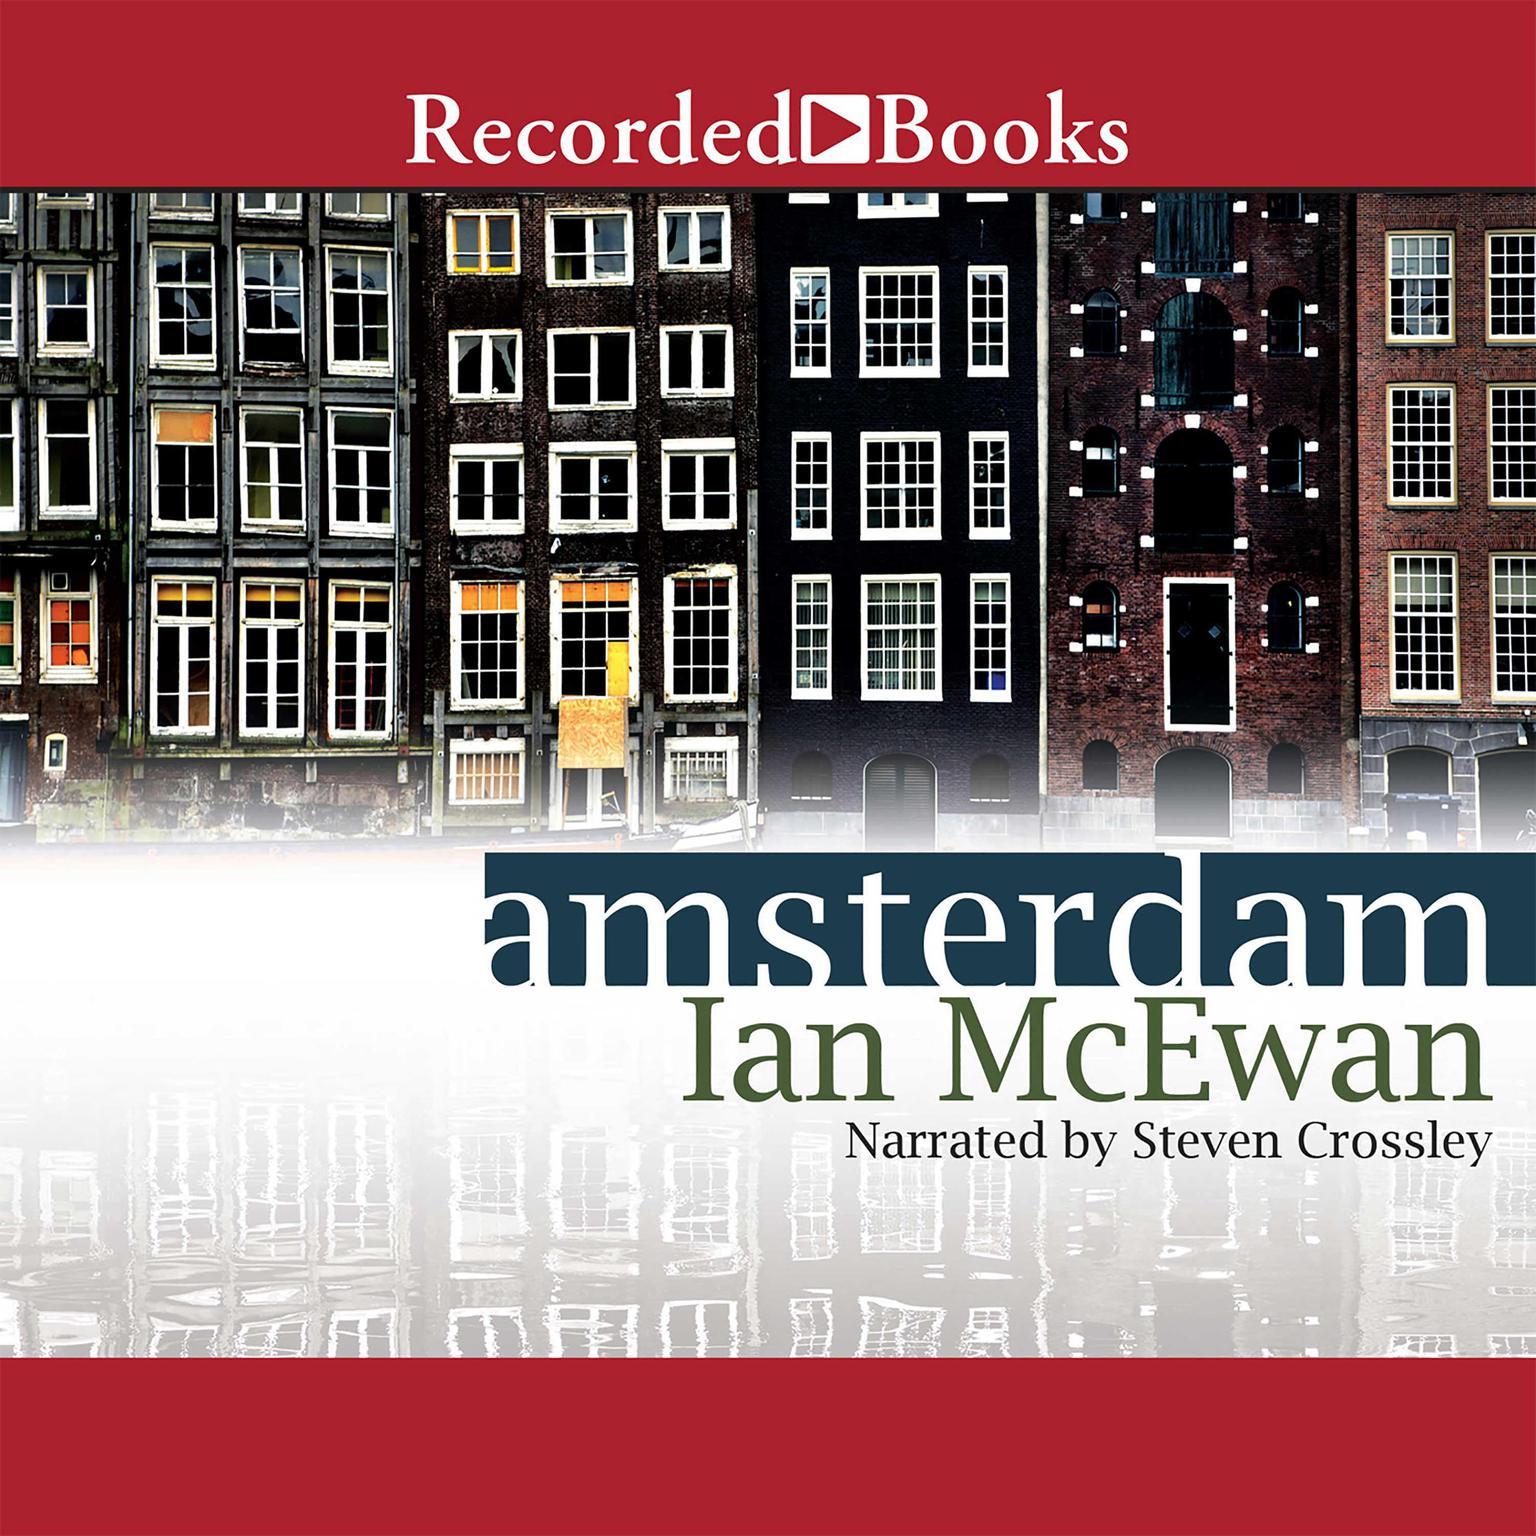 Amsterdam: A Novel Audiobook, by Ian McEwan